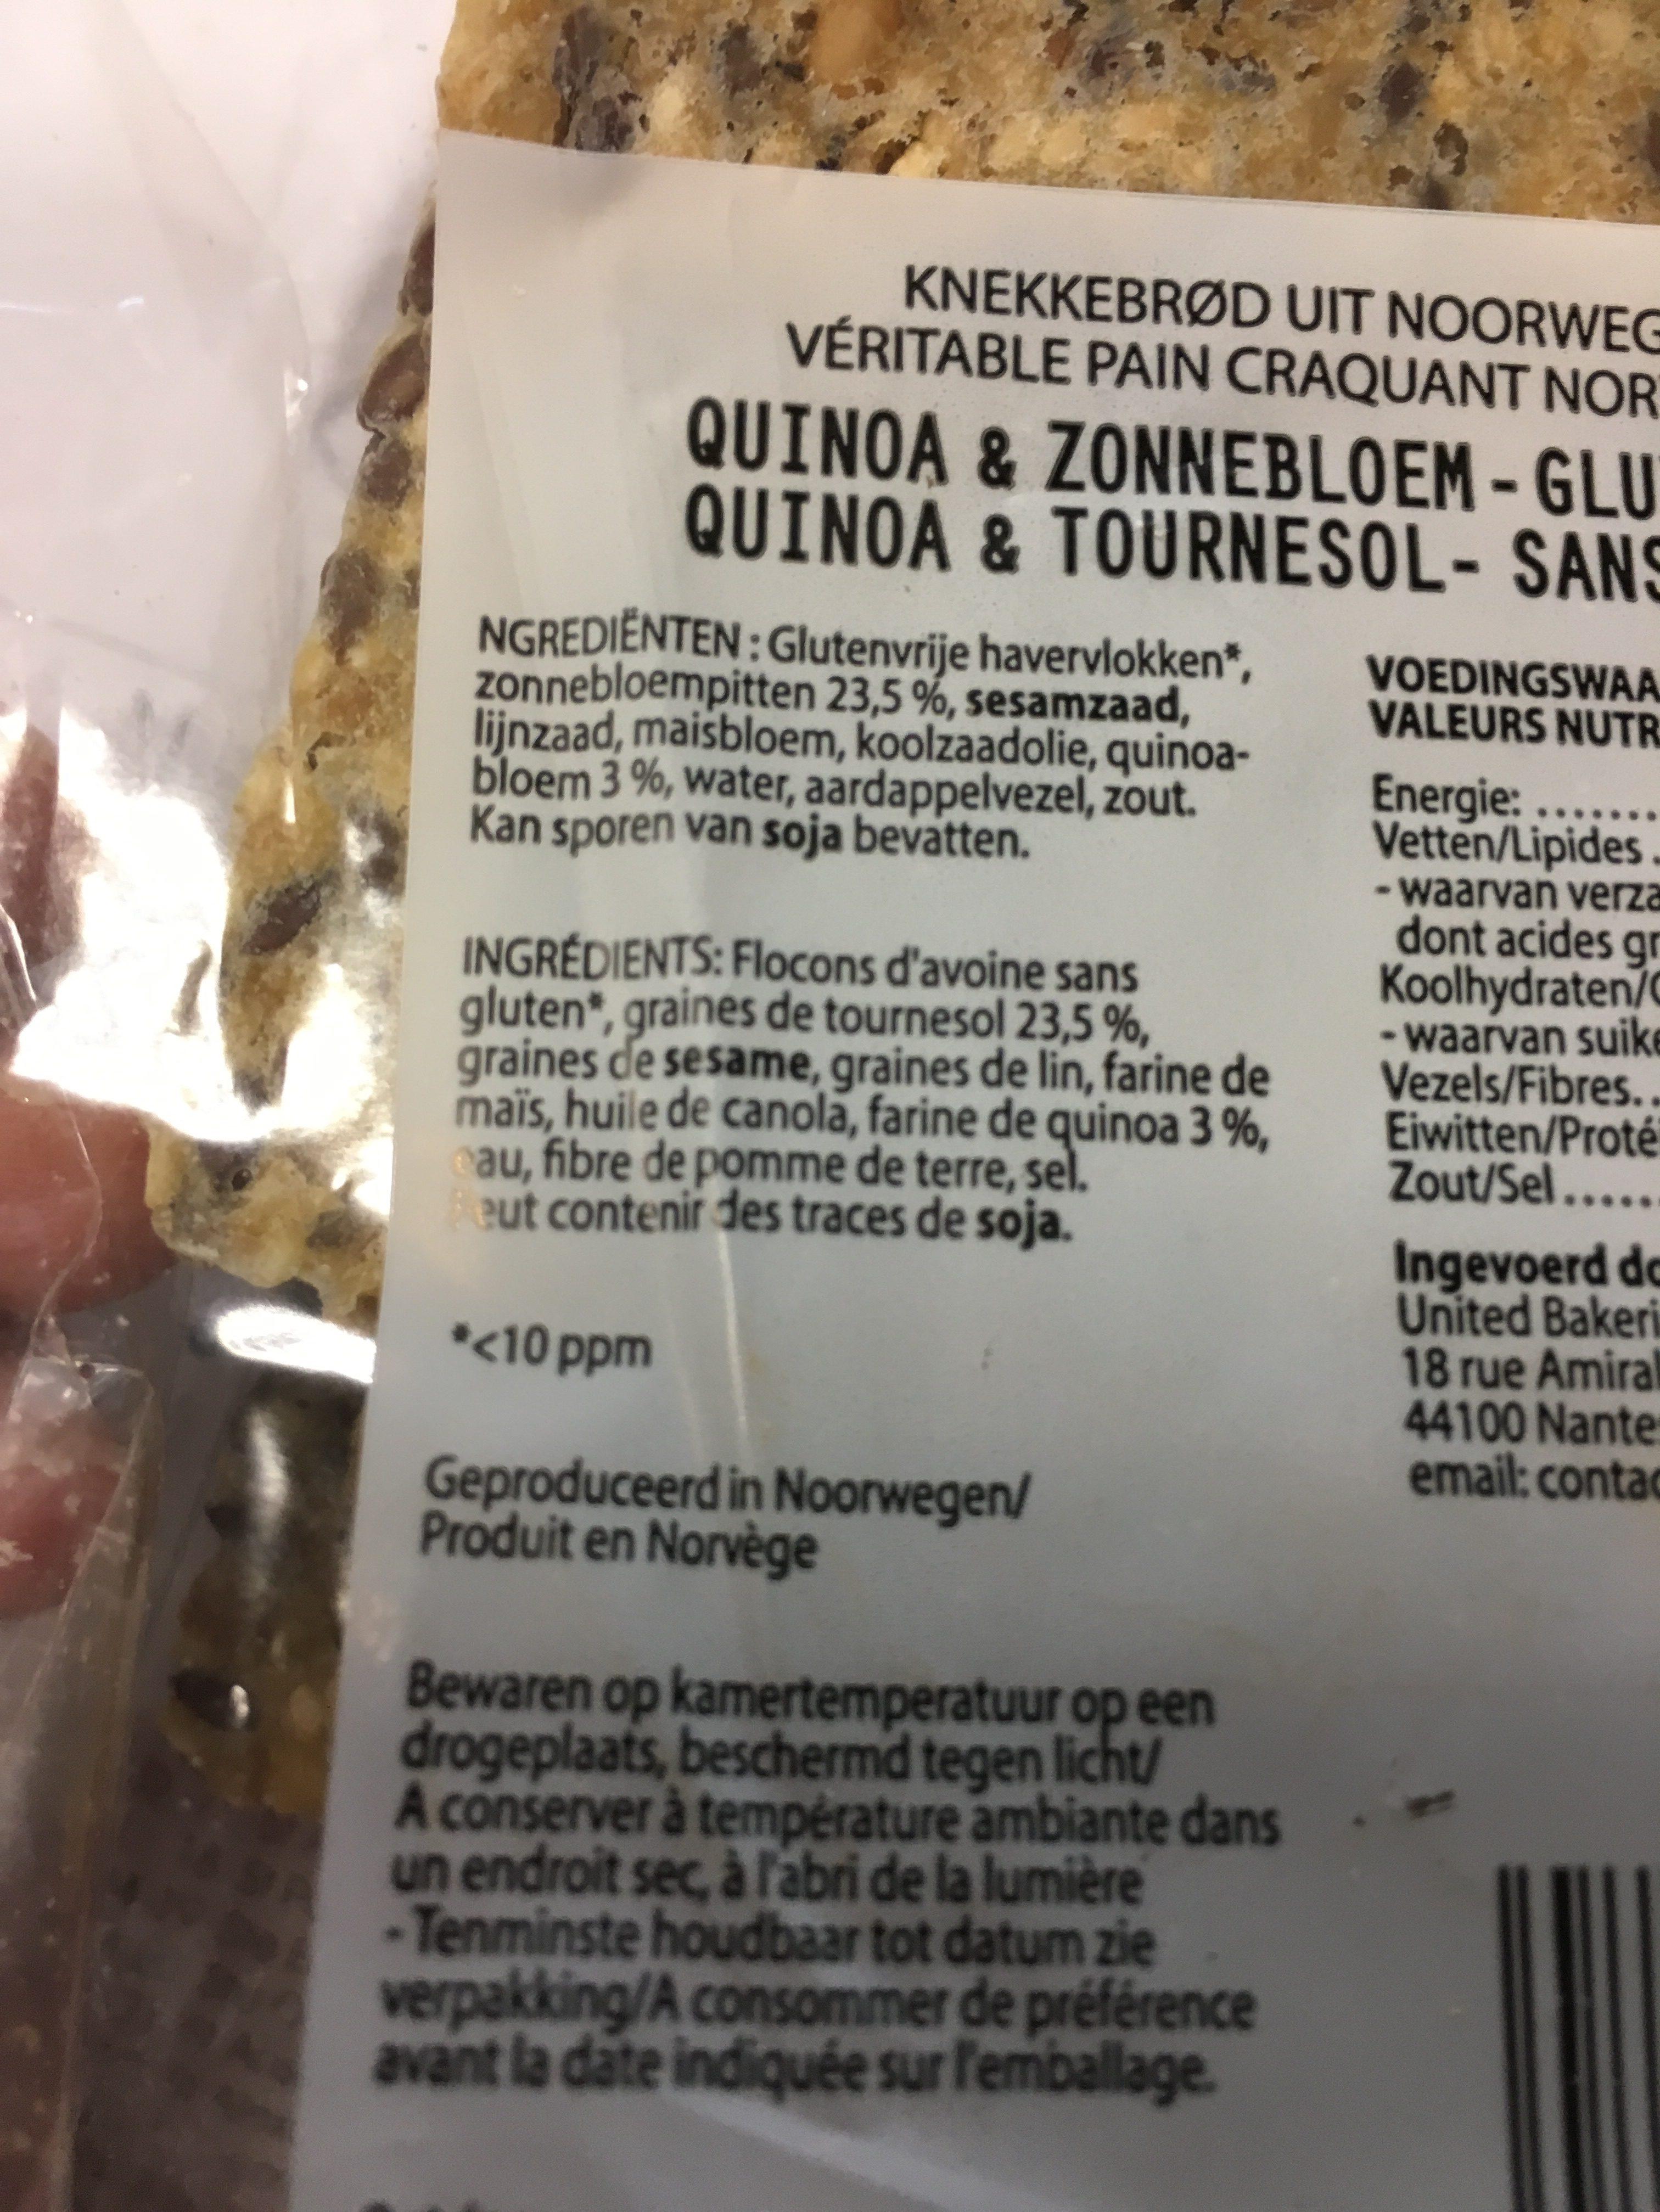 Pain Craquant Norvégien Quinoa Et Tournesol Sans Gluten Sigdal - Ingrediënten